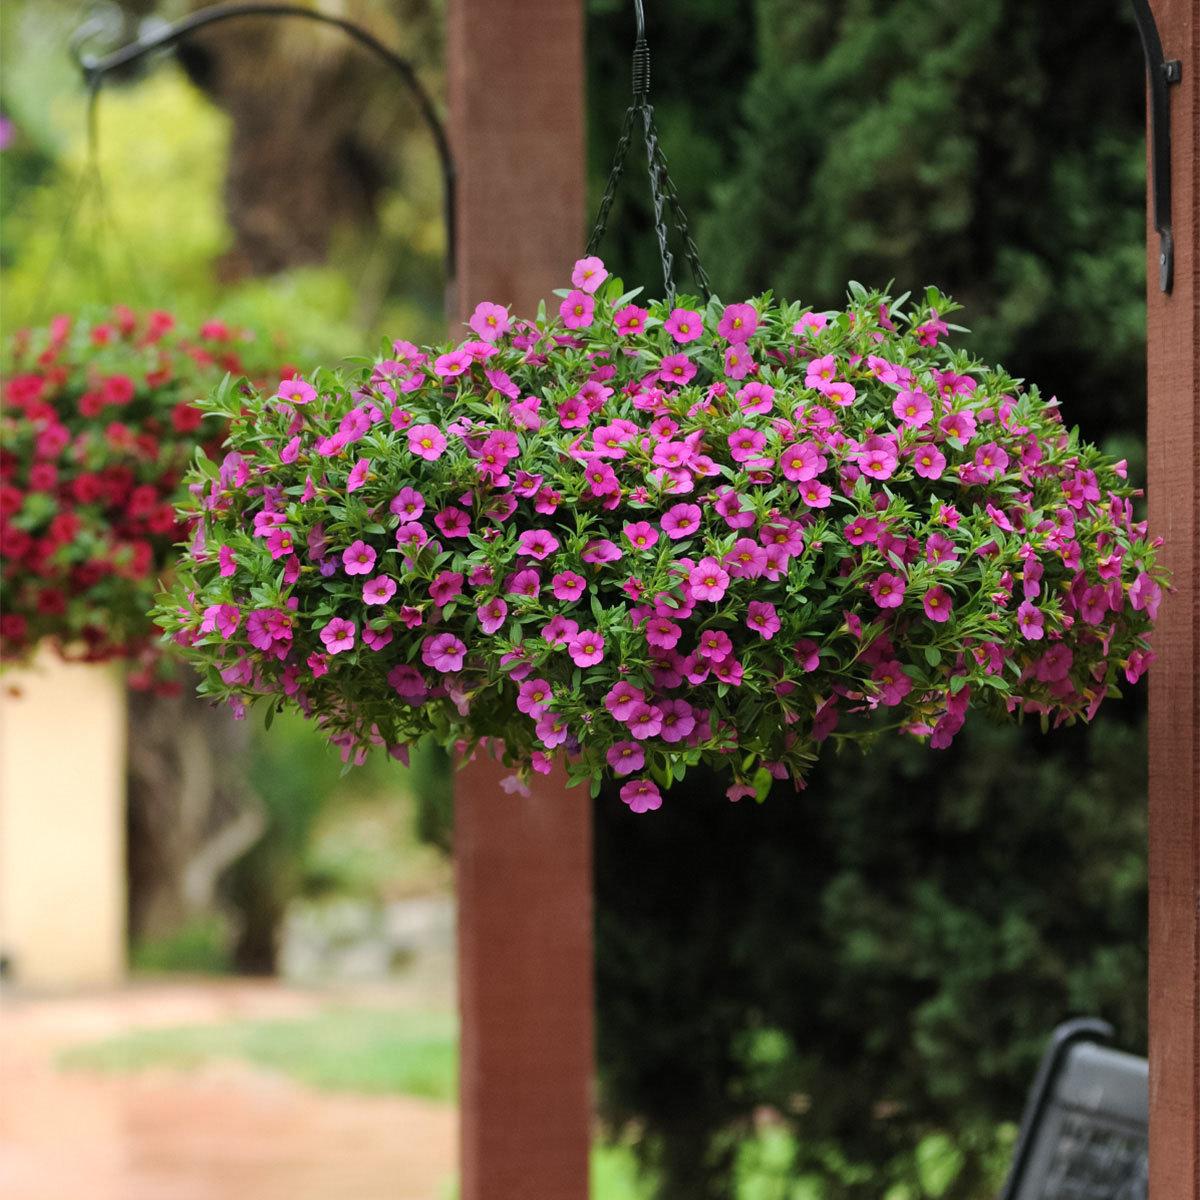 Calibrachoa-Petuniensamen Kabloom Deep Pink F1, Pillensaat | #5